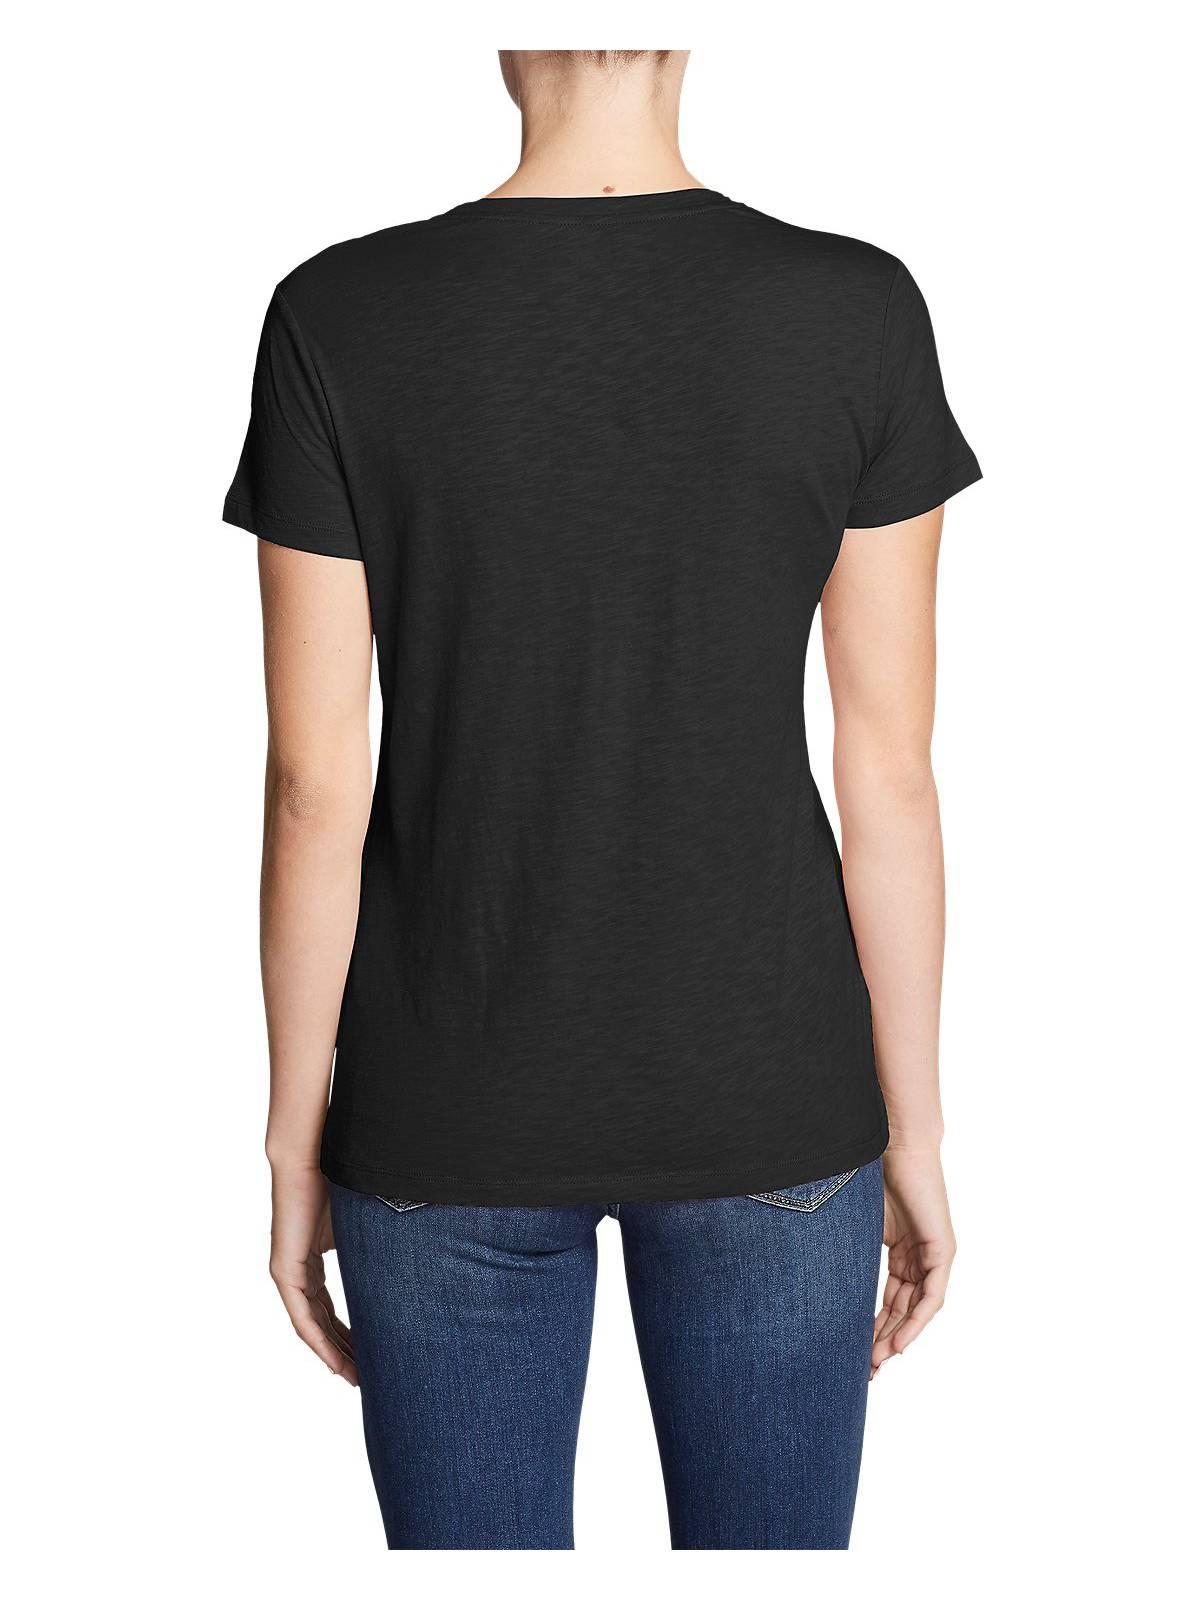 Eddie-Bauer-Women-039-s-Legend-Wash-Slub-Short-Sleeve-V-Neck-T-Shirt thumbnail 3